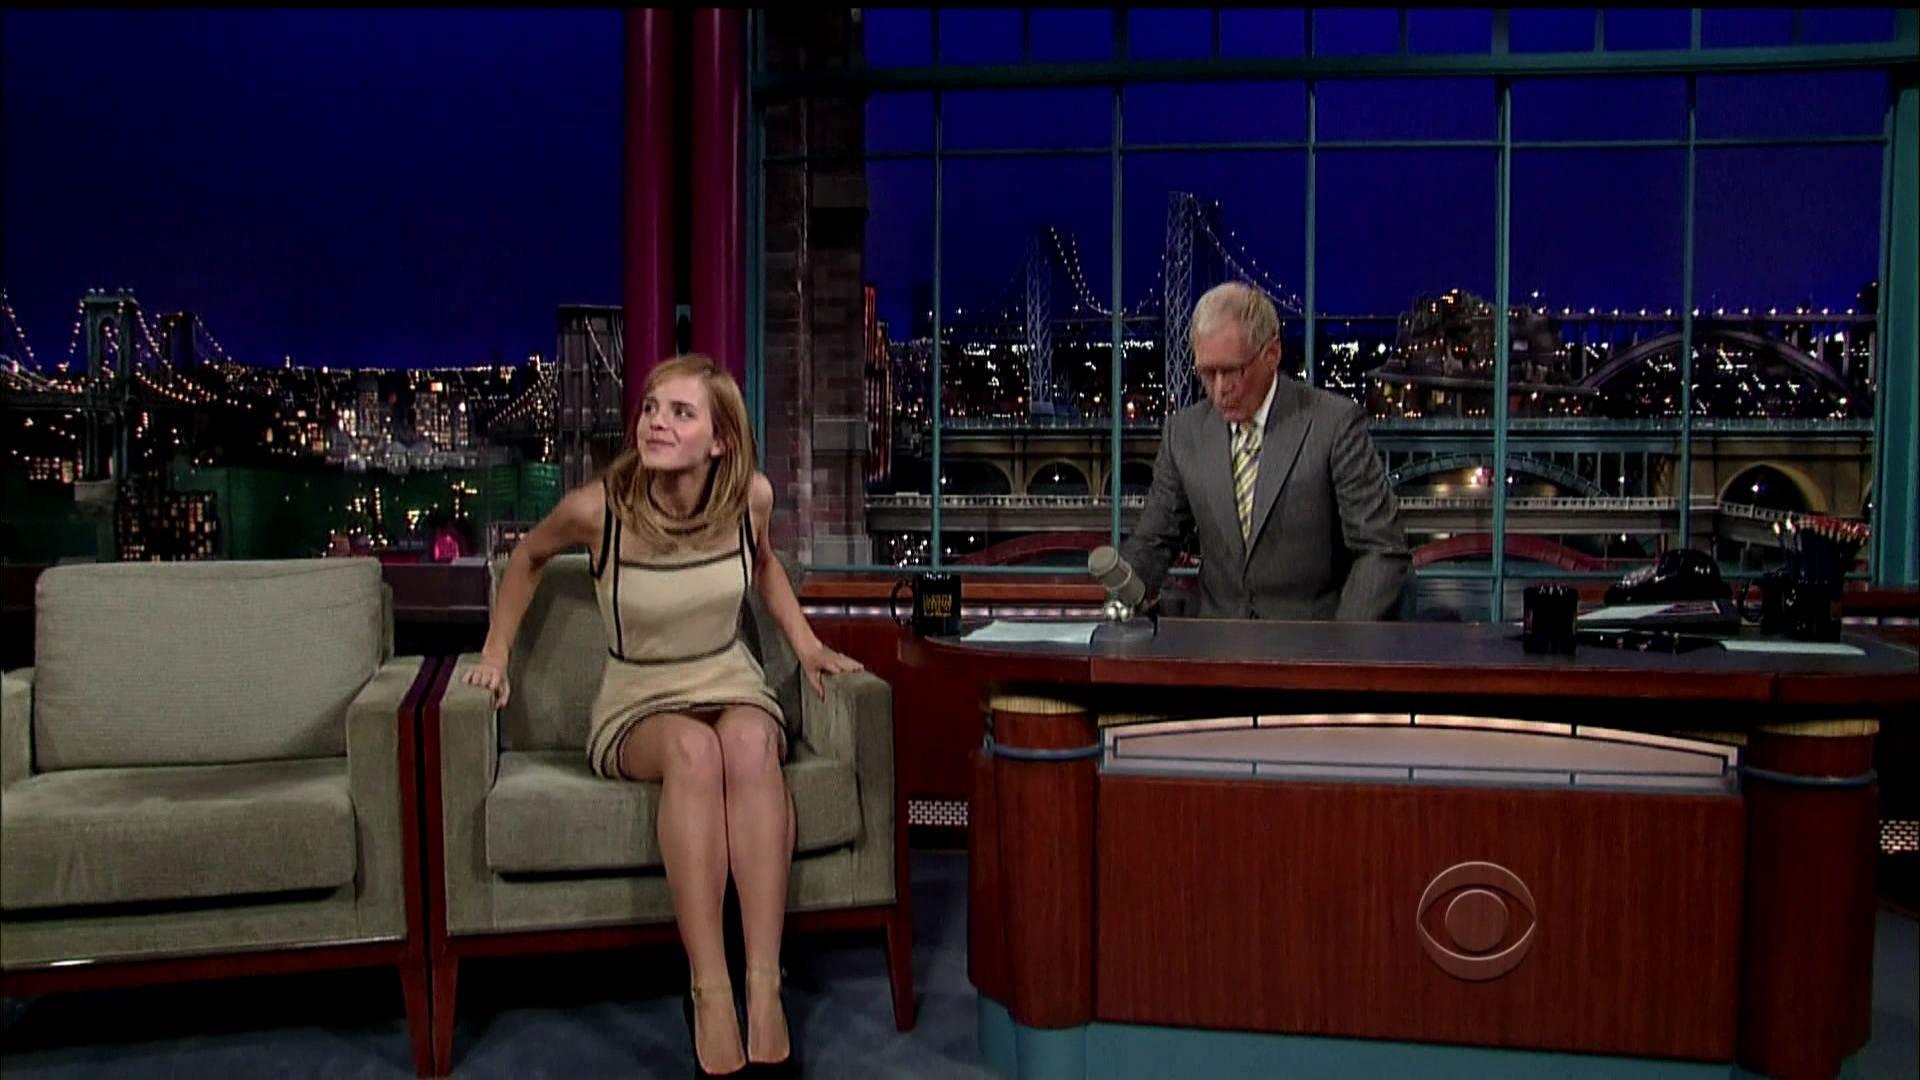 Emma Watson on David Letterman